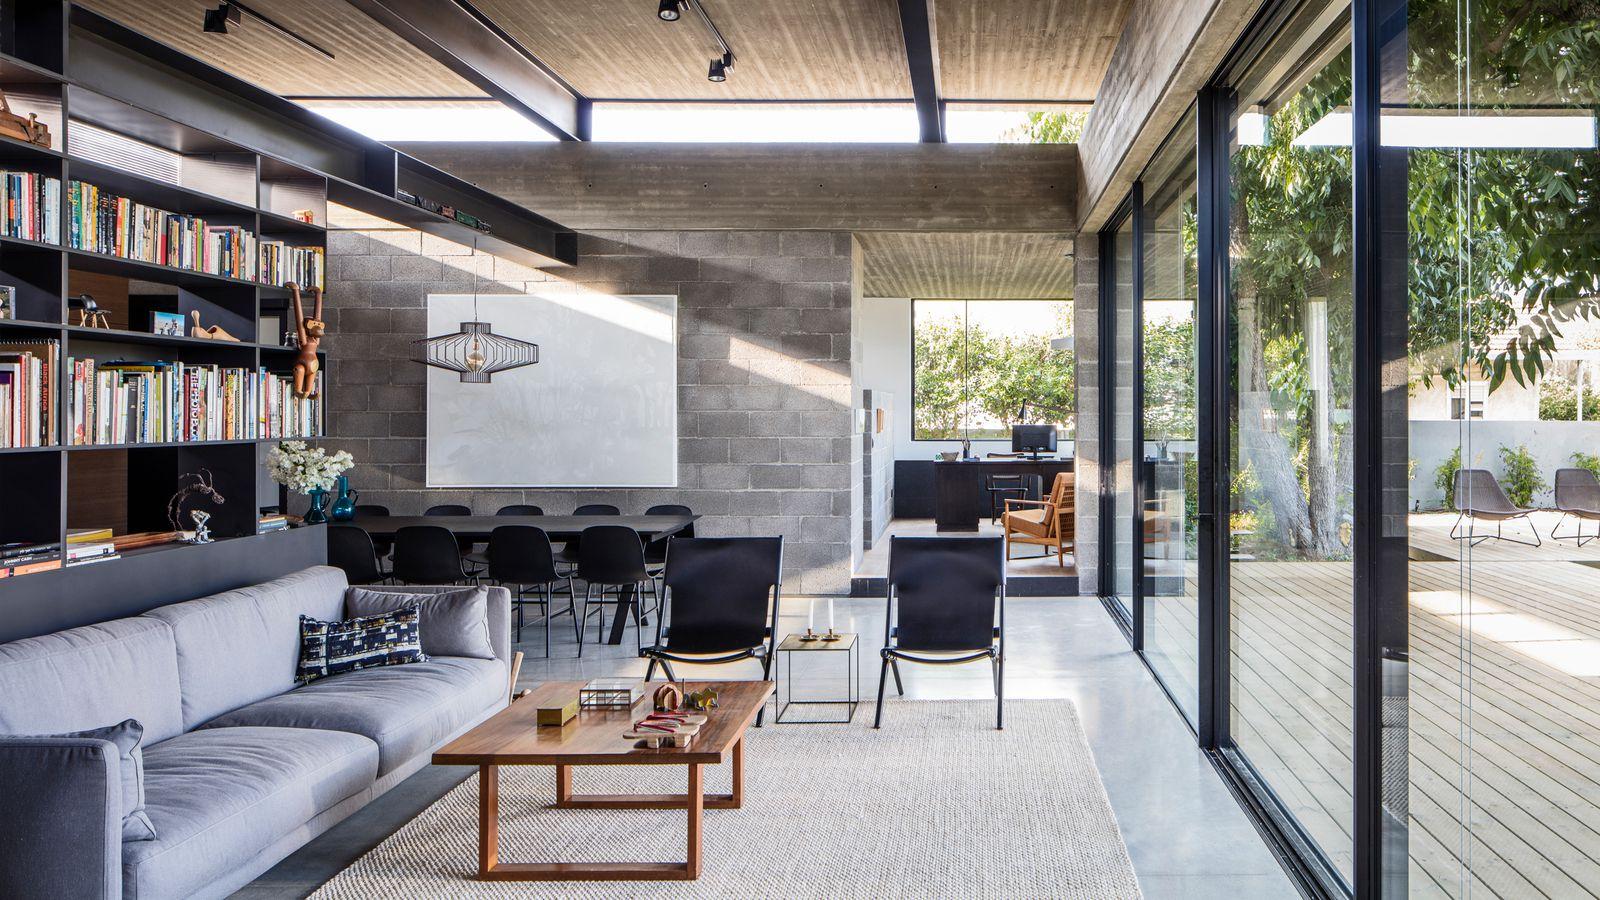 Concrete house offers indooroutdoor living among fruit